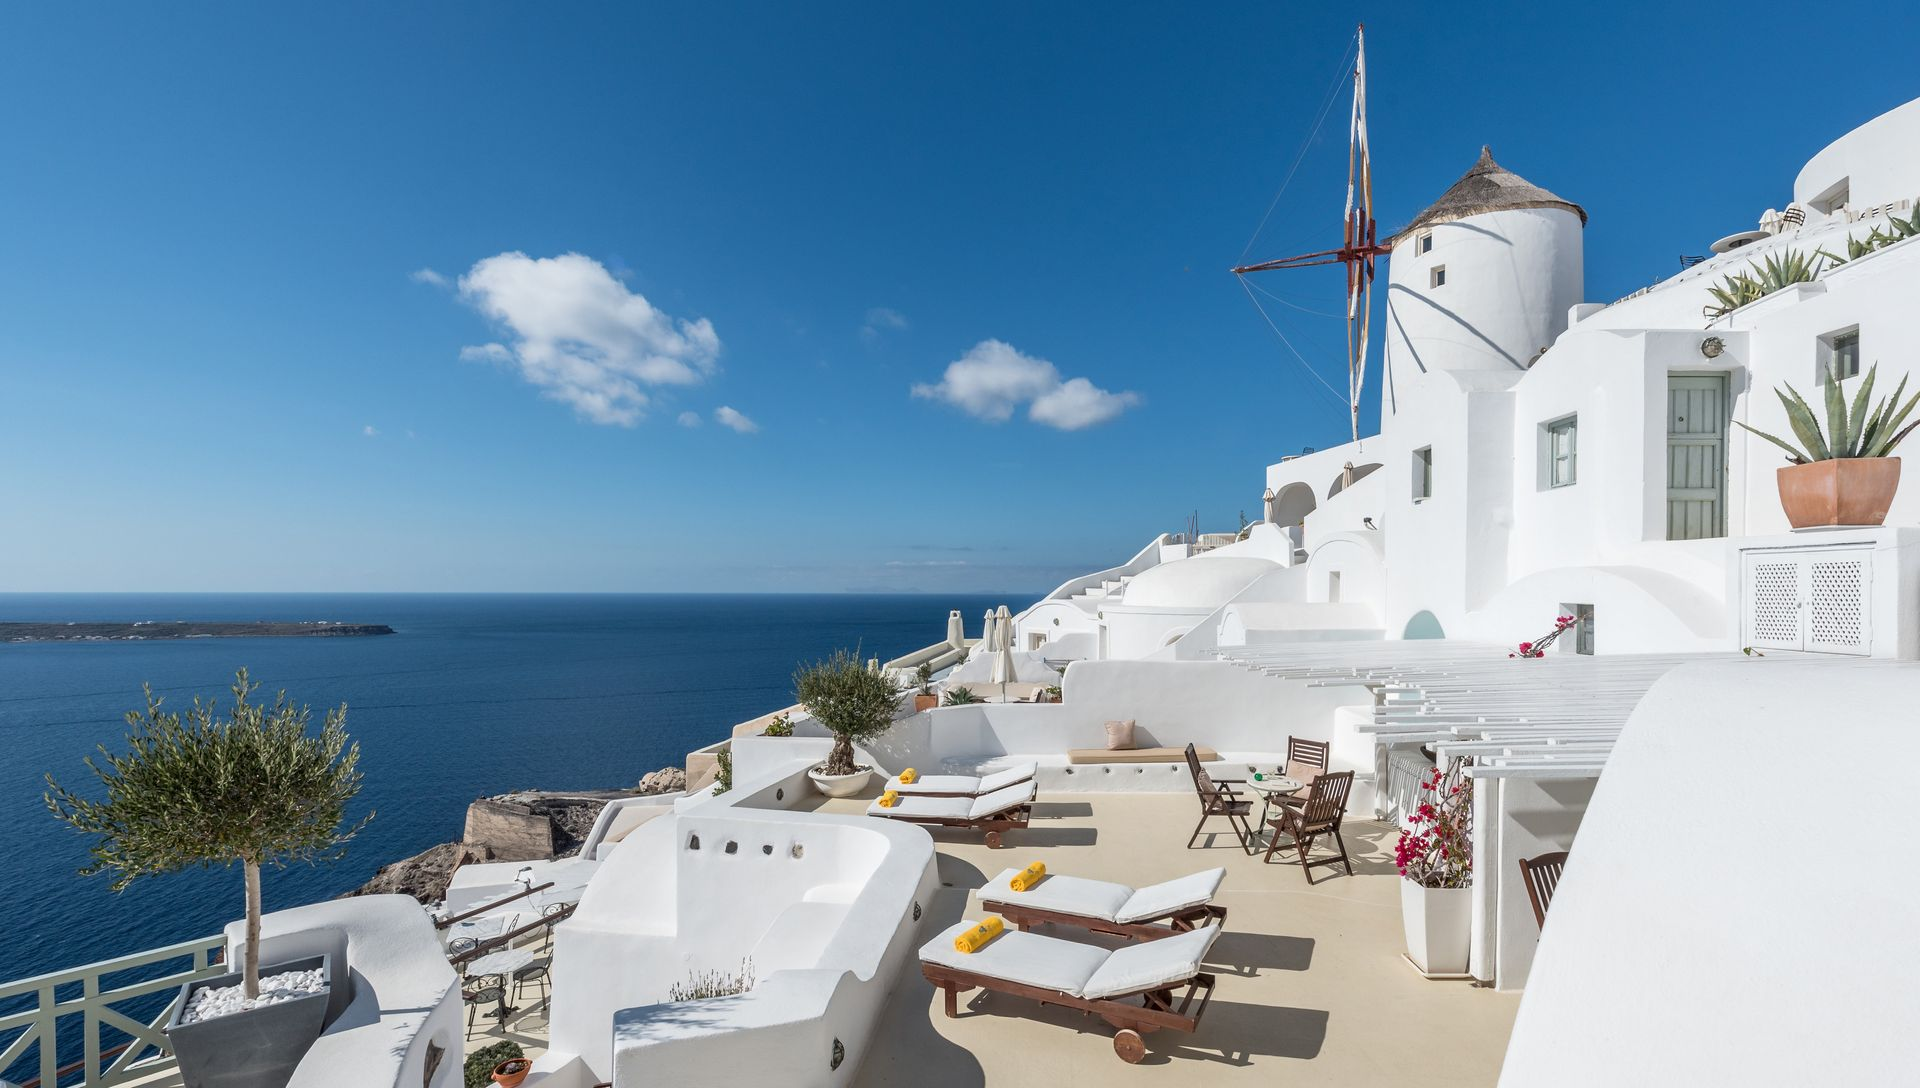 4* Fanari Villas Santorini - Σαντορίνη ✦ 2 Ημέρες (1 Διανυκτέρευση) ✦ 2 άτομα ✦ Πρωινό ✦ 01/07/2020 έως 30/09/2020 ✦ Υπέροχη Τοποθεσία!